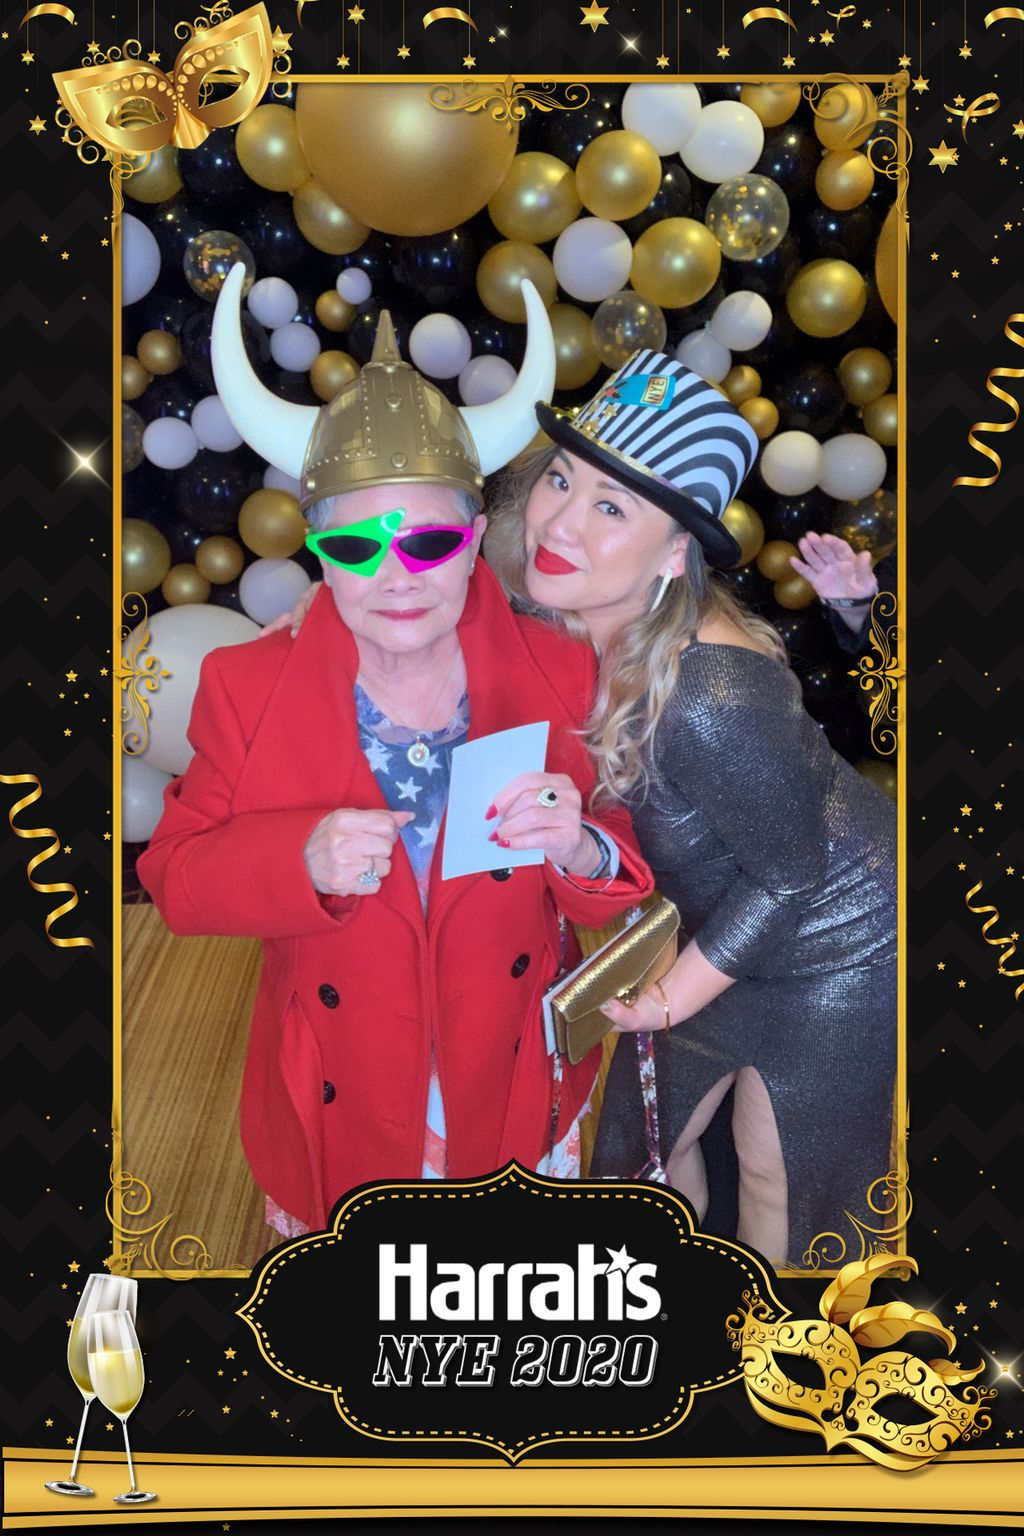 Harrah's New Years Eve